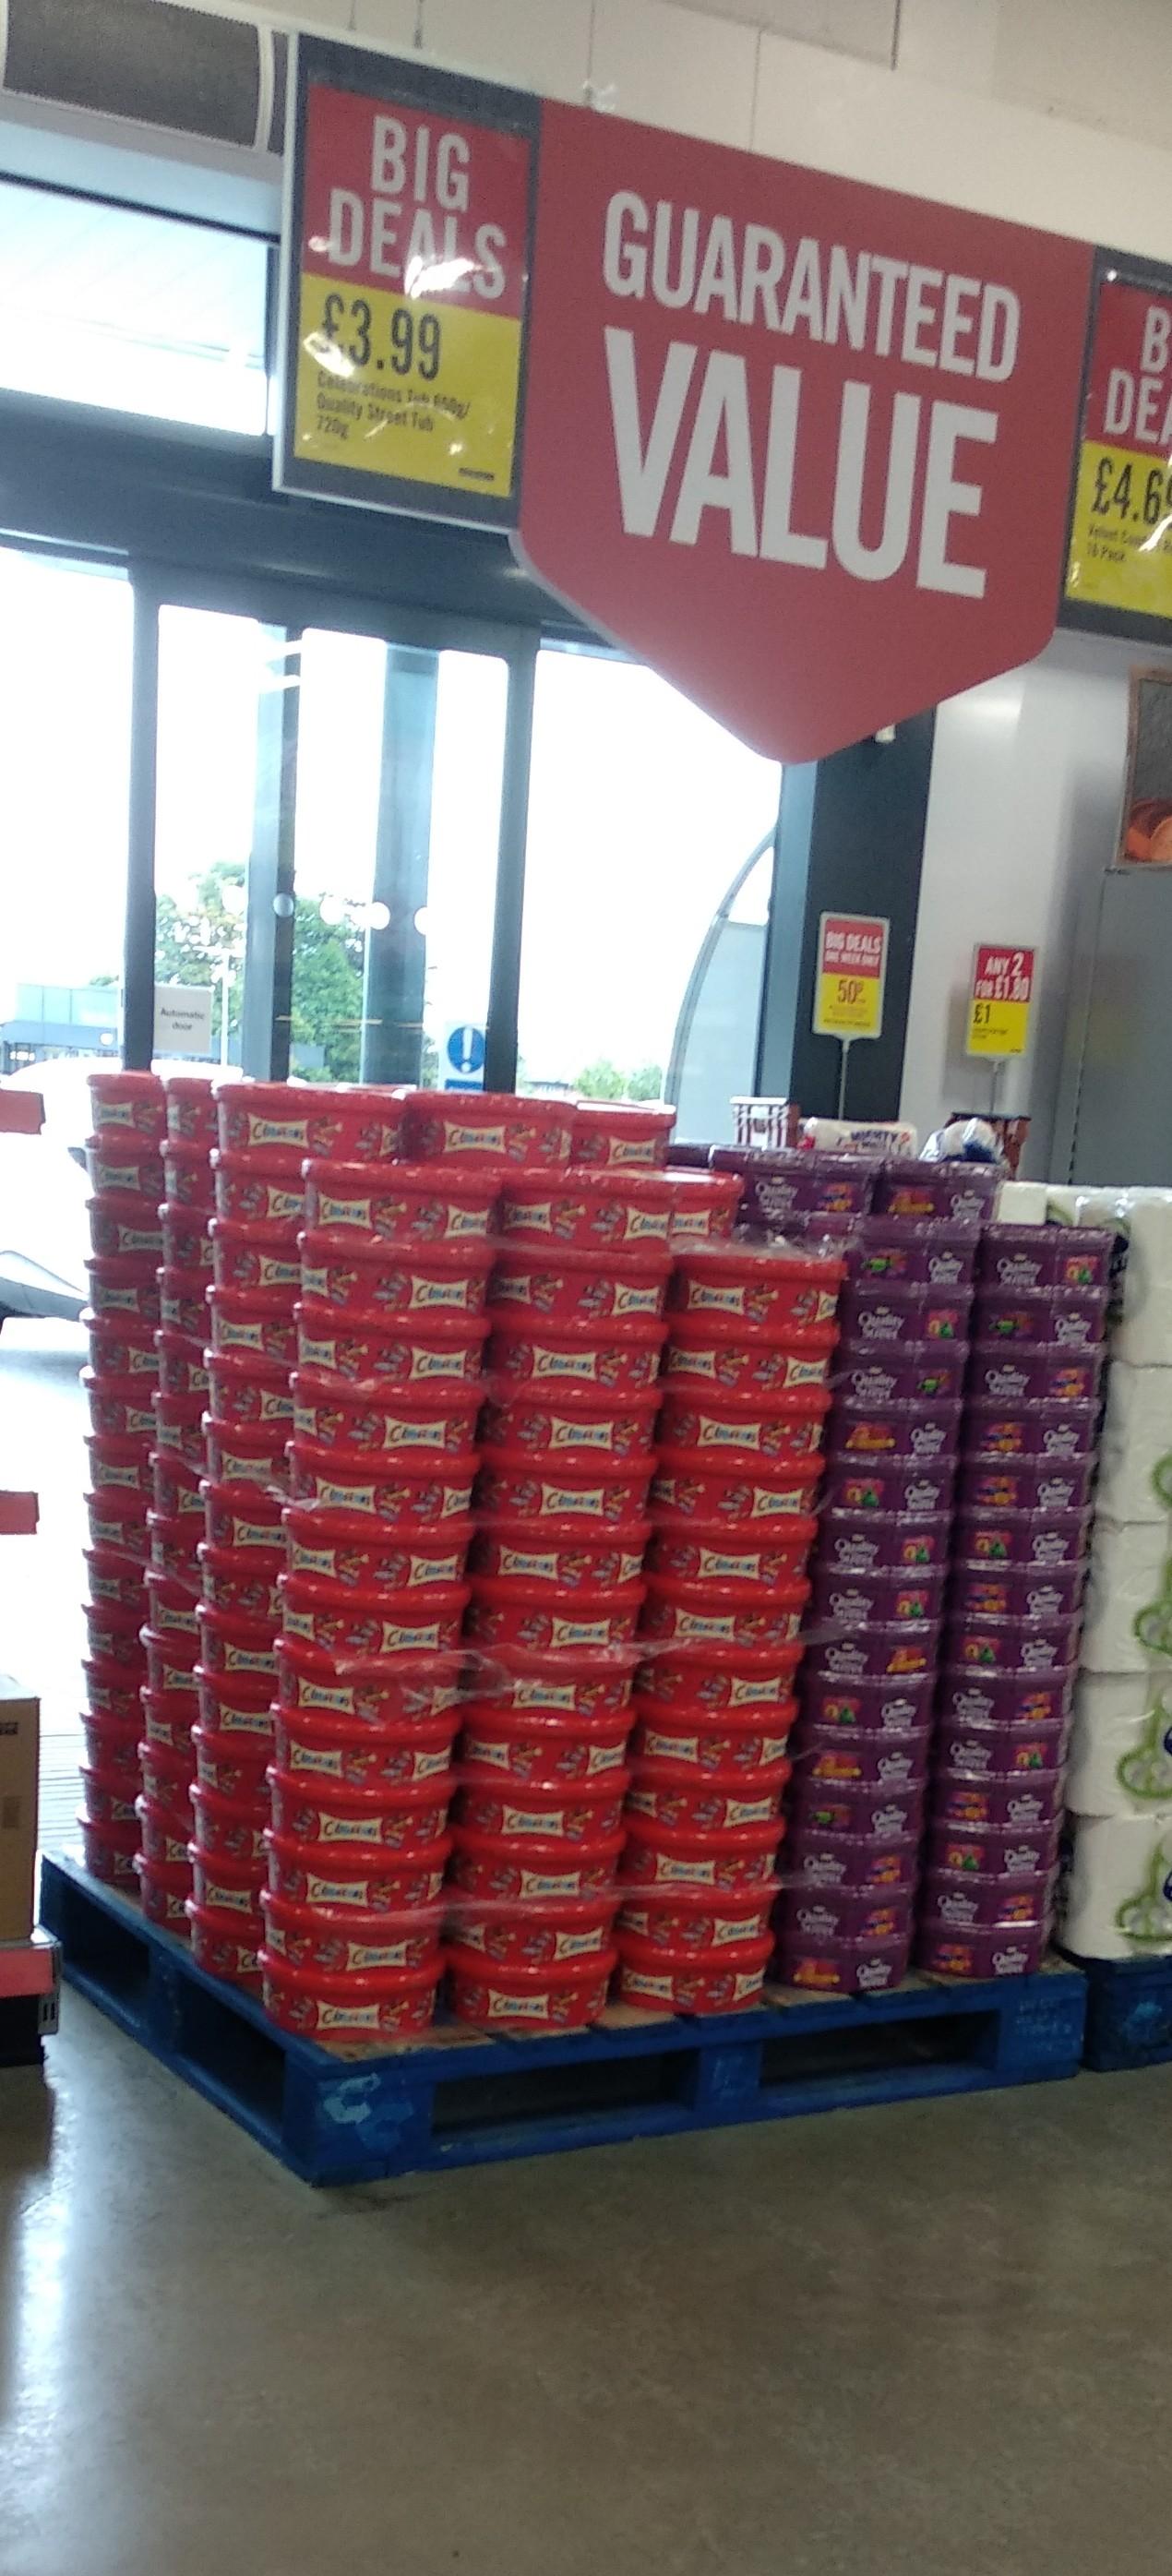 Celebrations tub 650g/ Quality Street tub 750g £3.99 each @ Iceland Food Warehouse